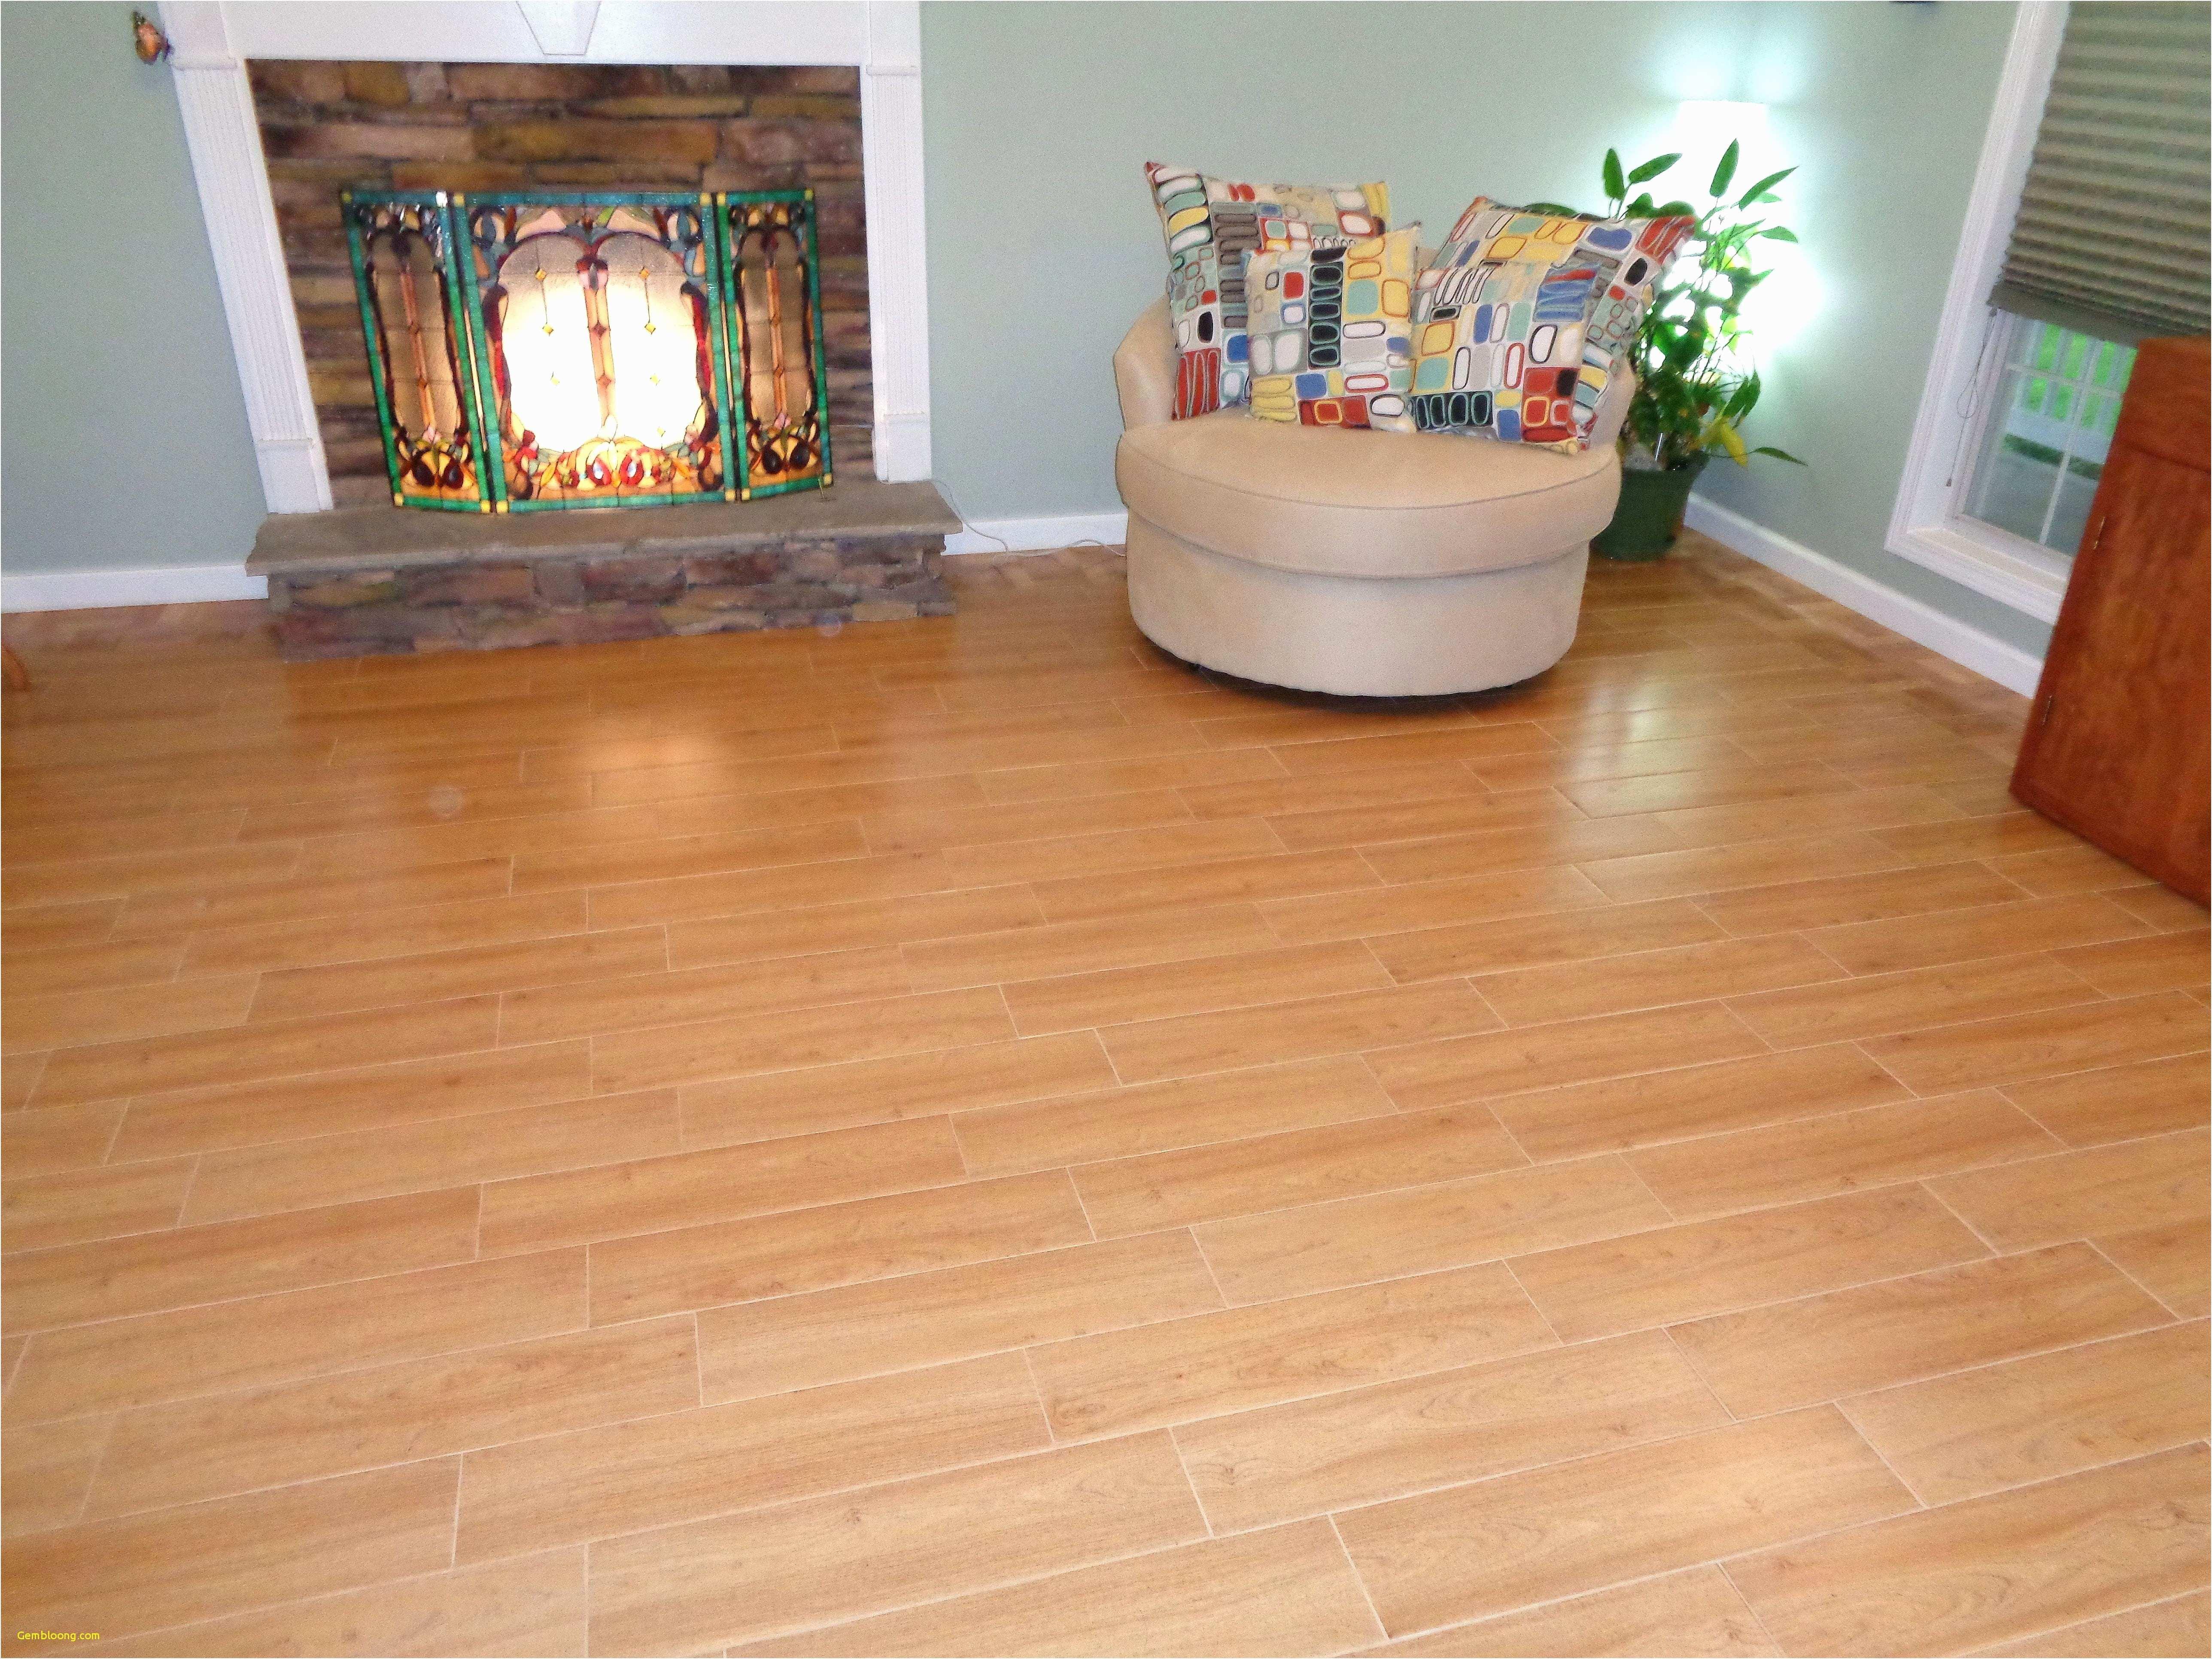 where to buy hardwood flooring near me of wood for floors facesinnature with regard to wood for floors discount laminate flooring laminate wood flooring sale best